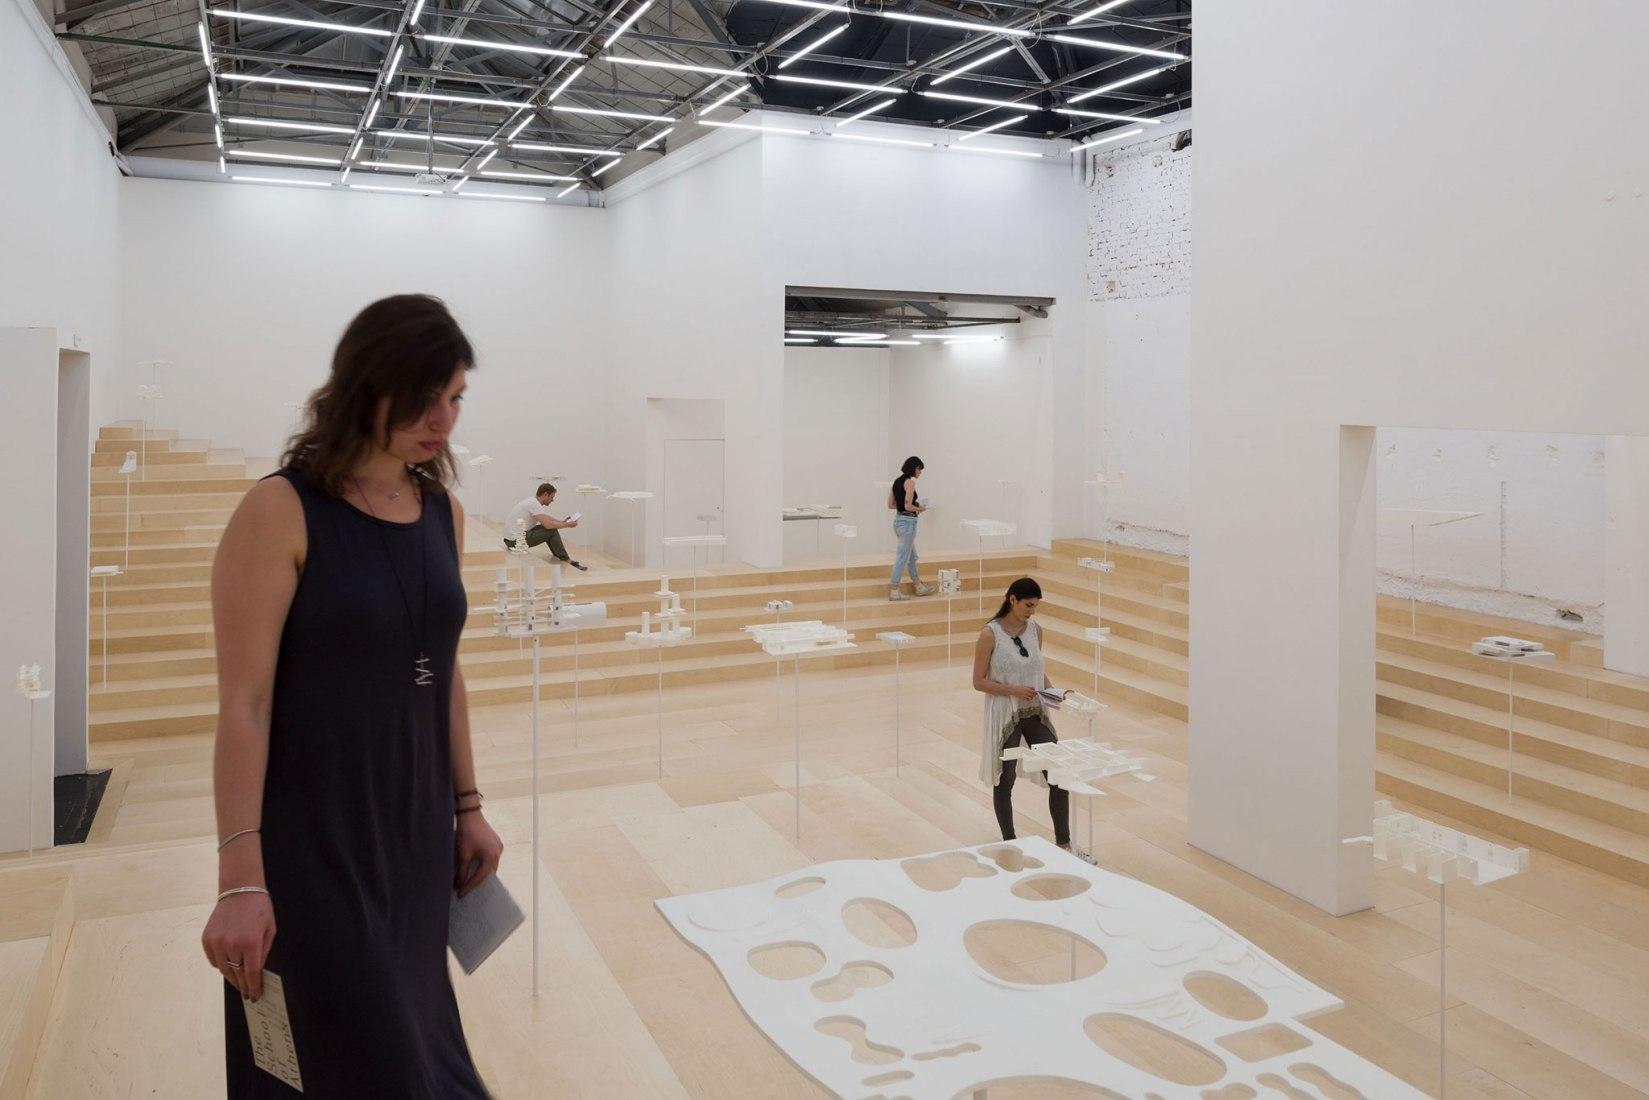 Interior view. The School of Athens, Neiheiser Argyros. Greece Pavilion for the Biennale Architettura di Venezia 2018. Photograph by Ugo Carmeni